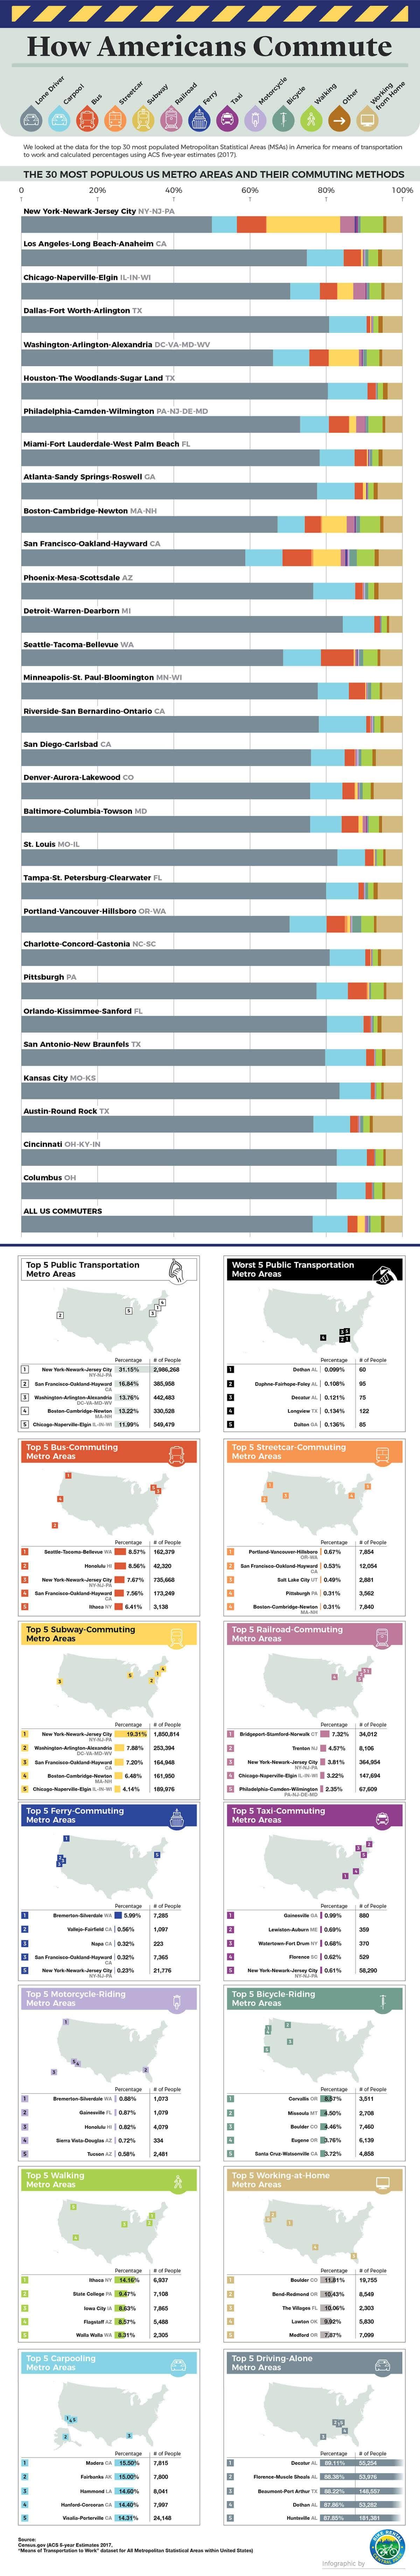 Americans Commute info